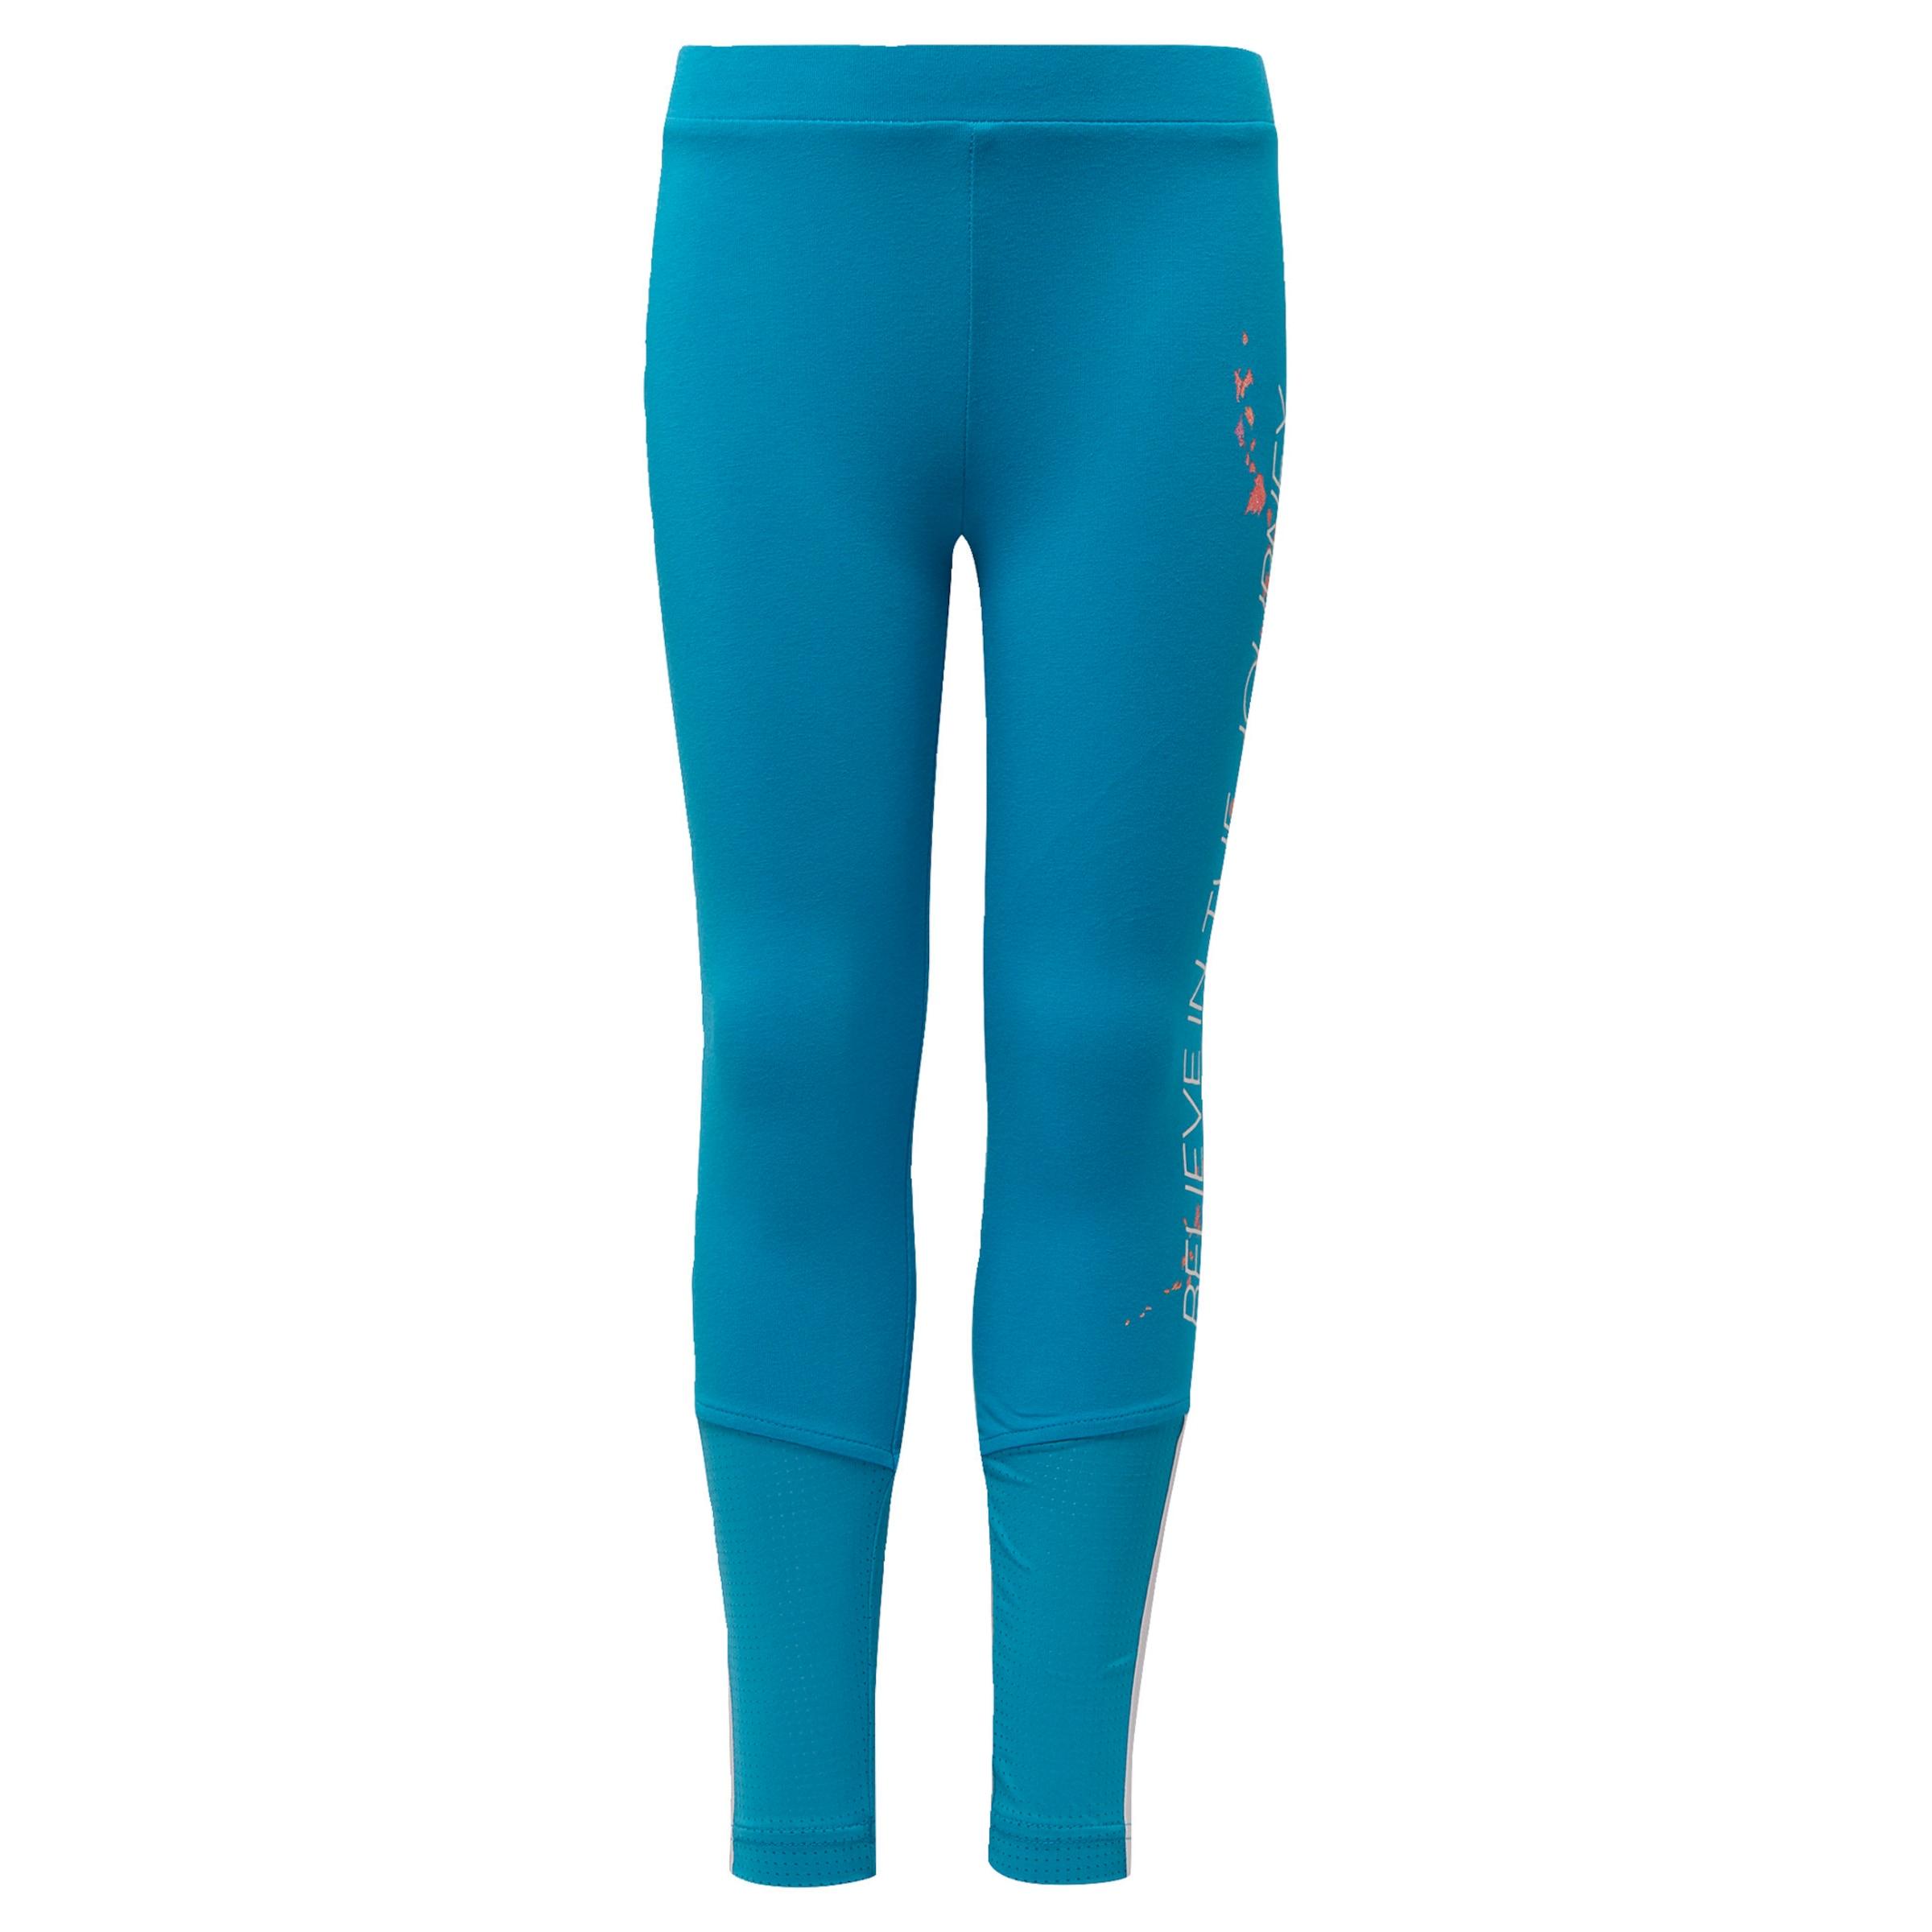 Jungen,  Kinder,  Kinder ADIDAS PERFORMANCE Sporthose blau, grau   04062049573903